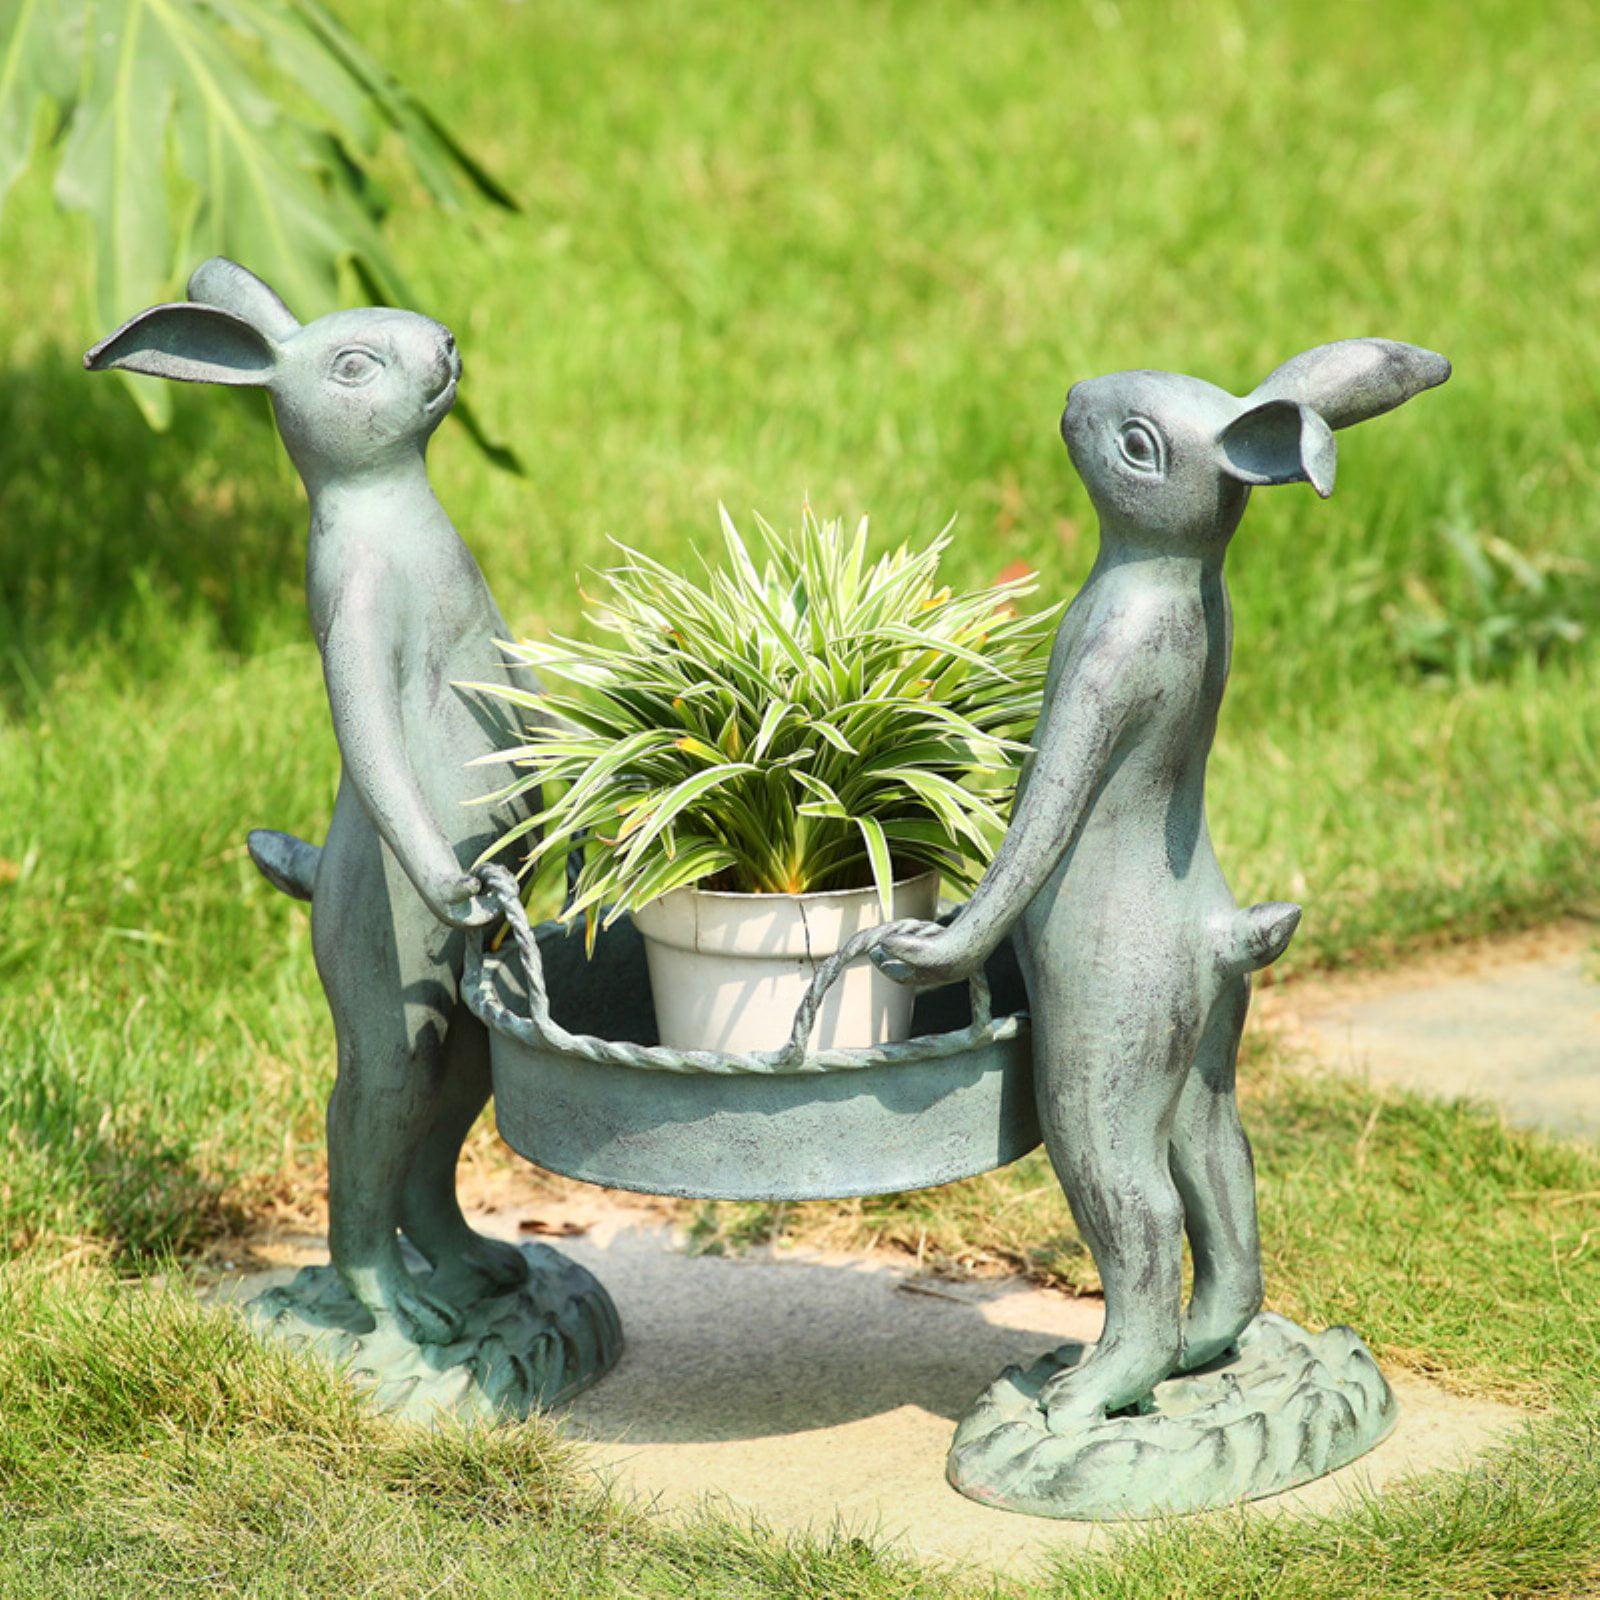 San Pacific International Bunny Gardeners Planter